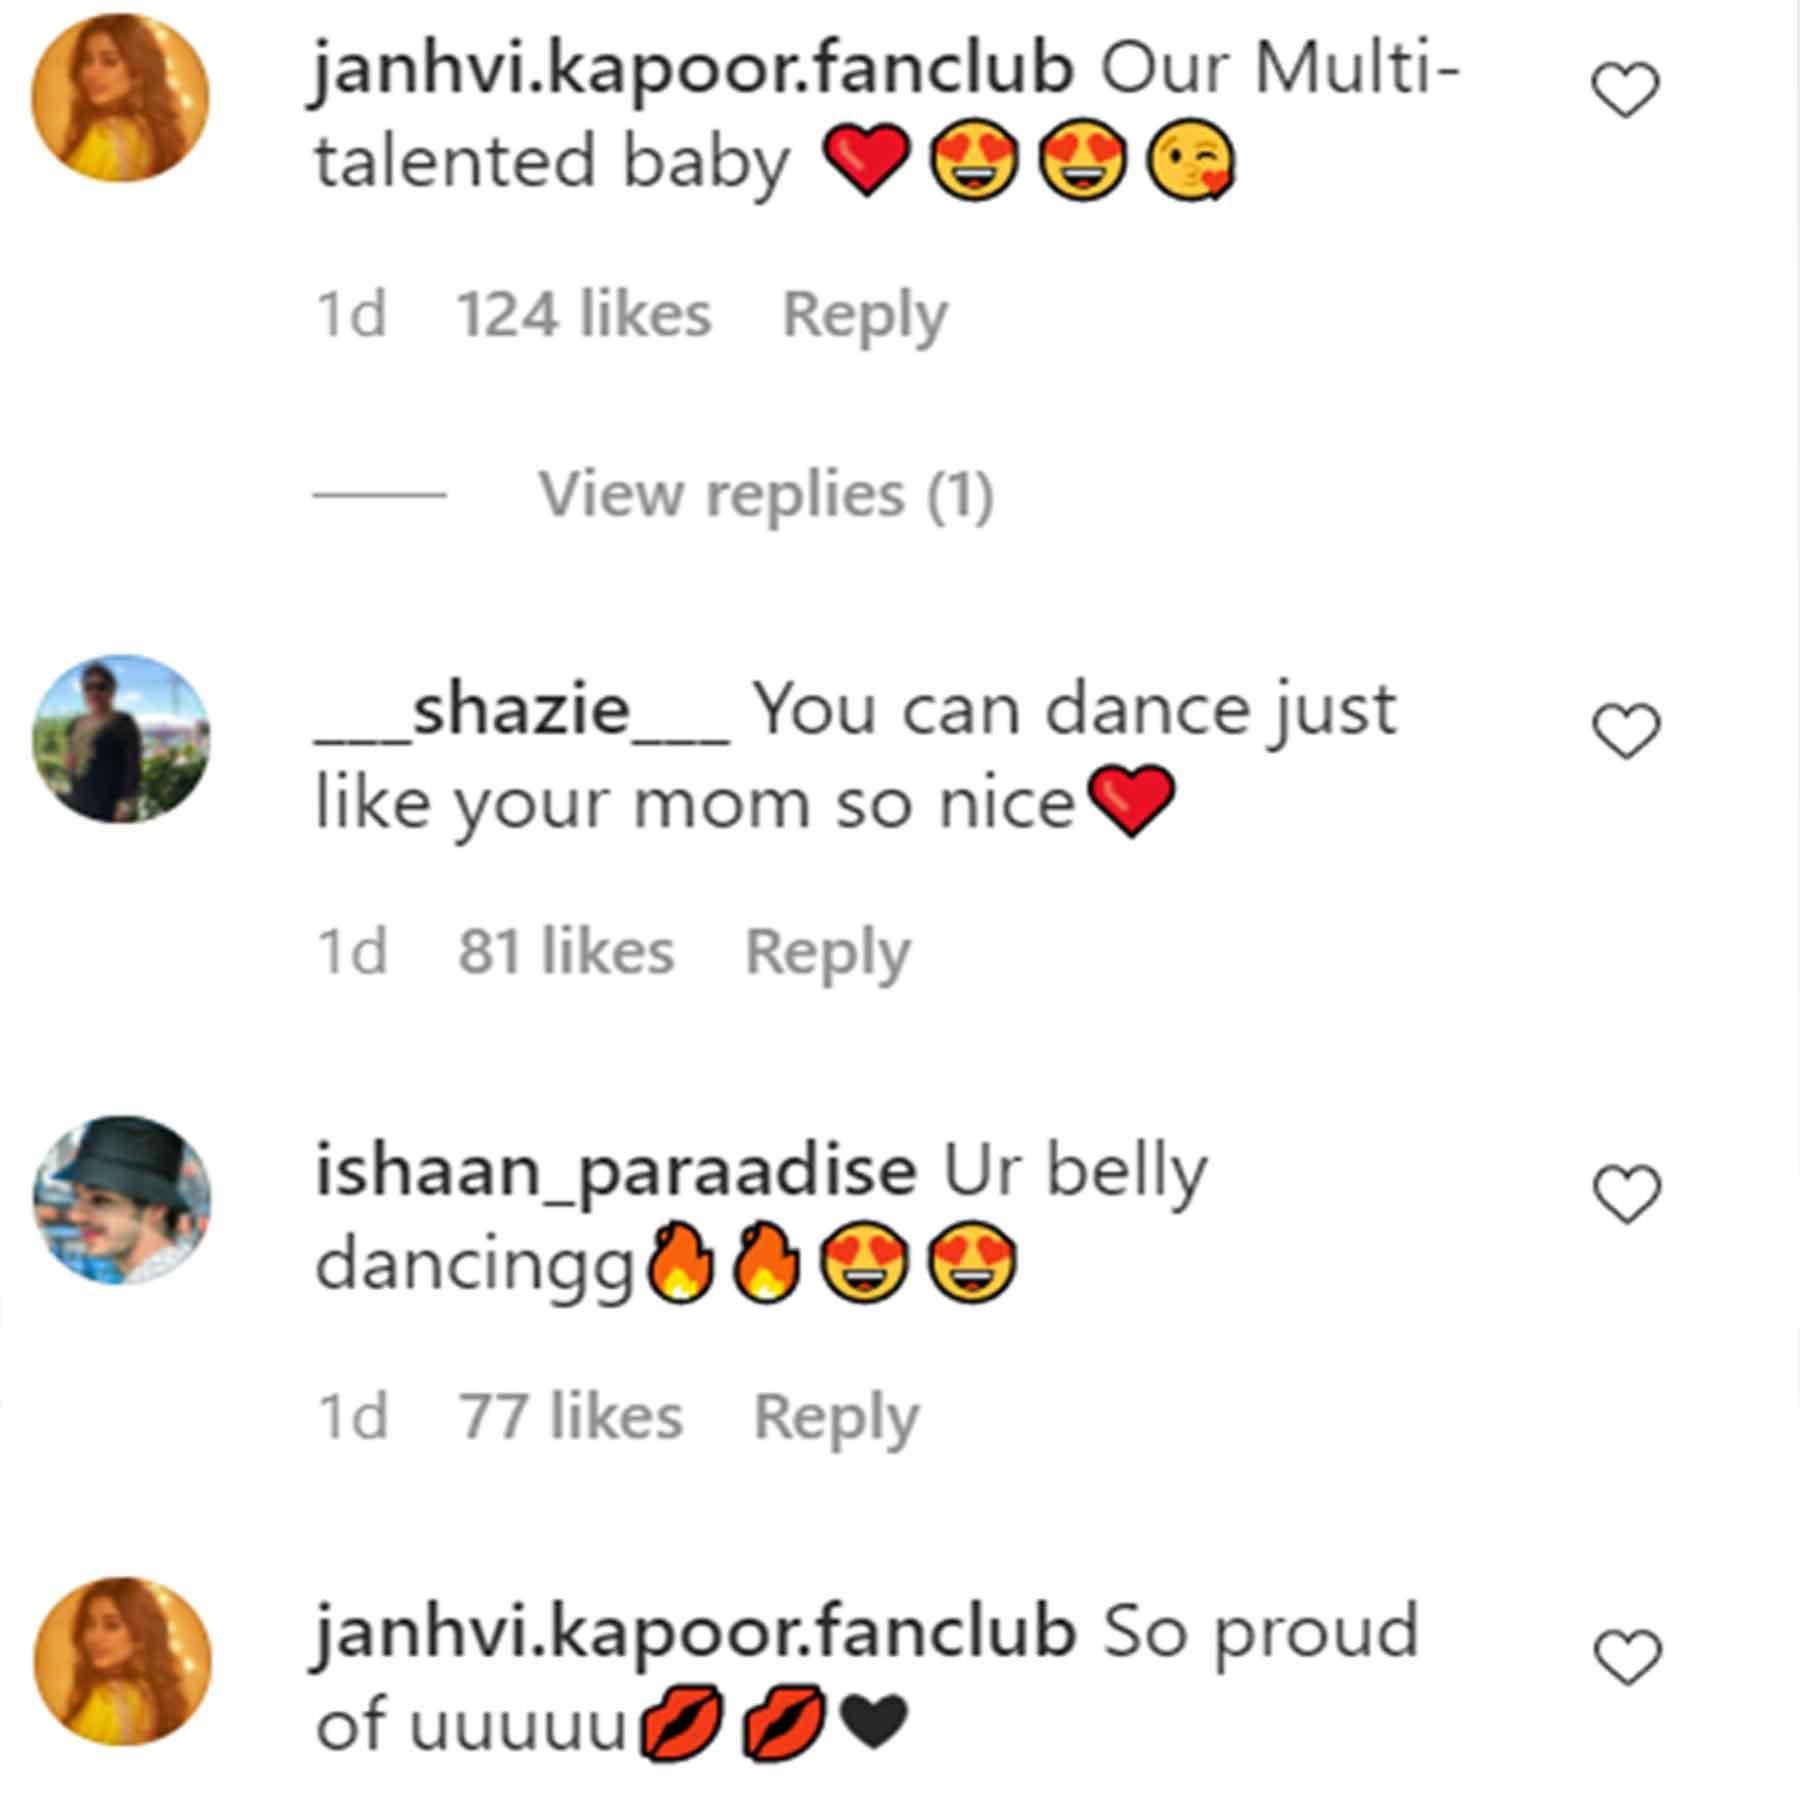 Janhvi Kapoor's Hot Belly Dance To SRK And Kareena's Song San Sanana